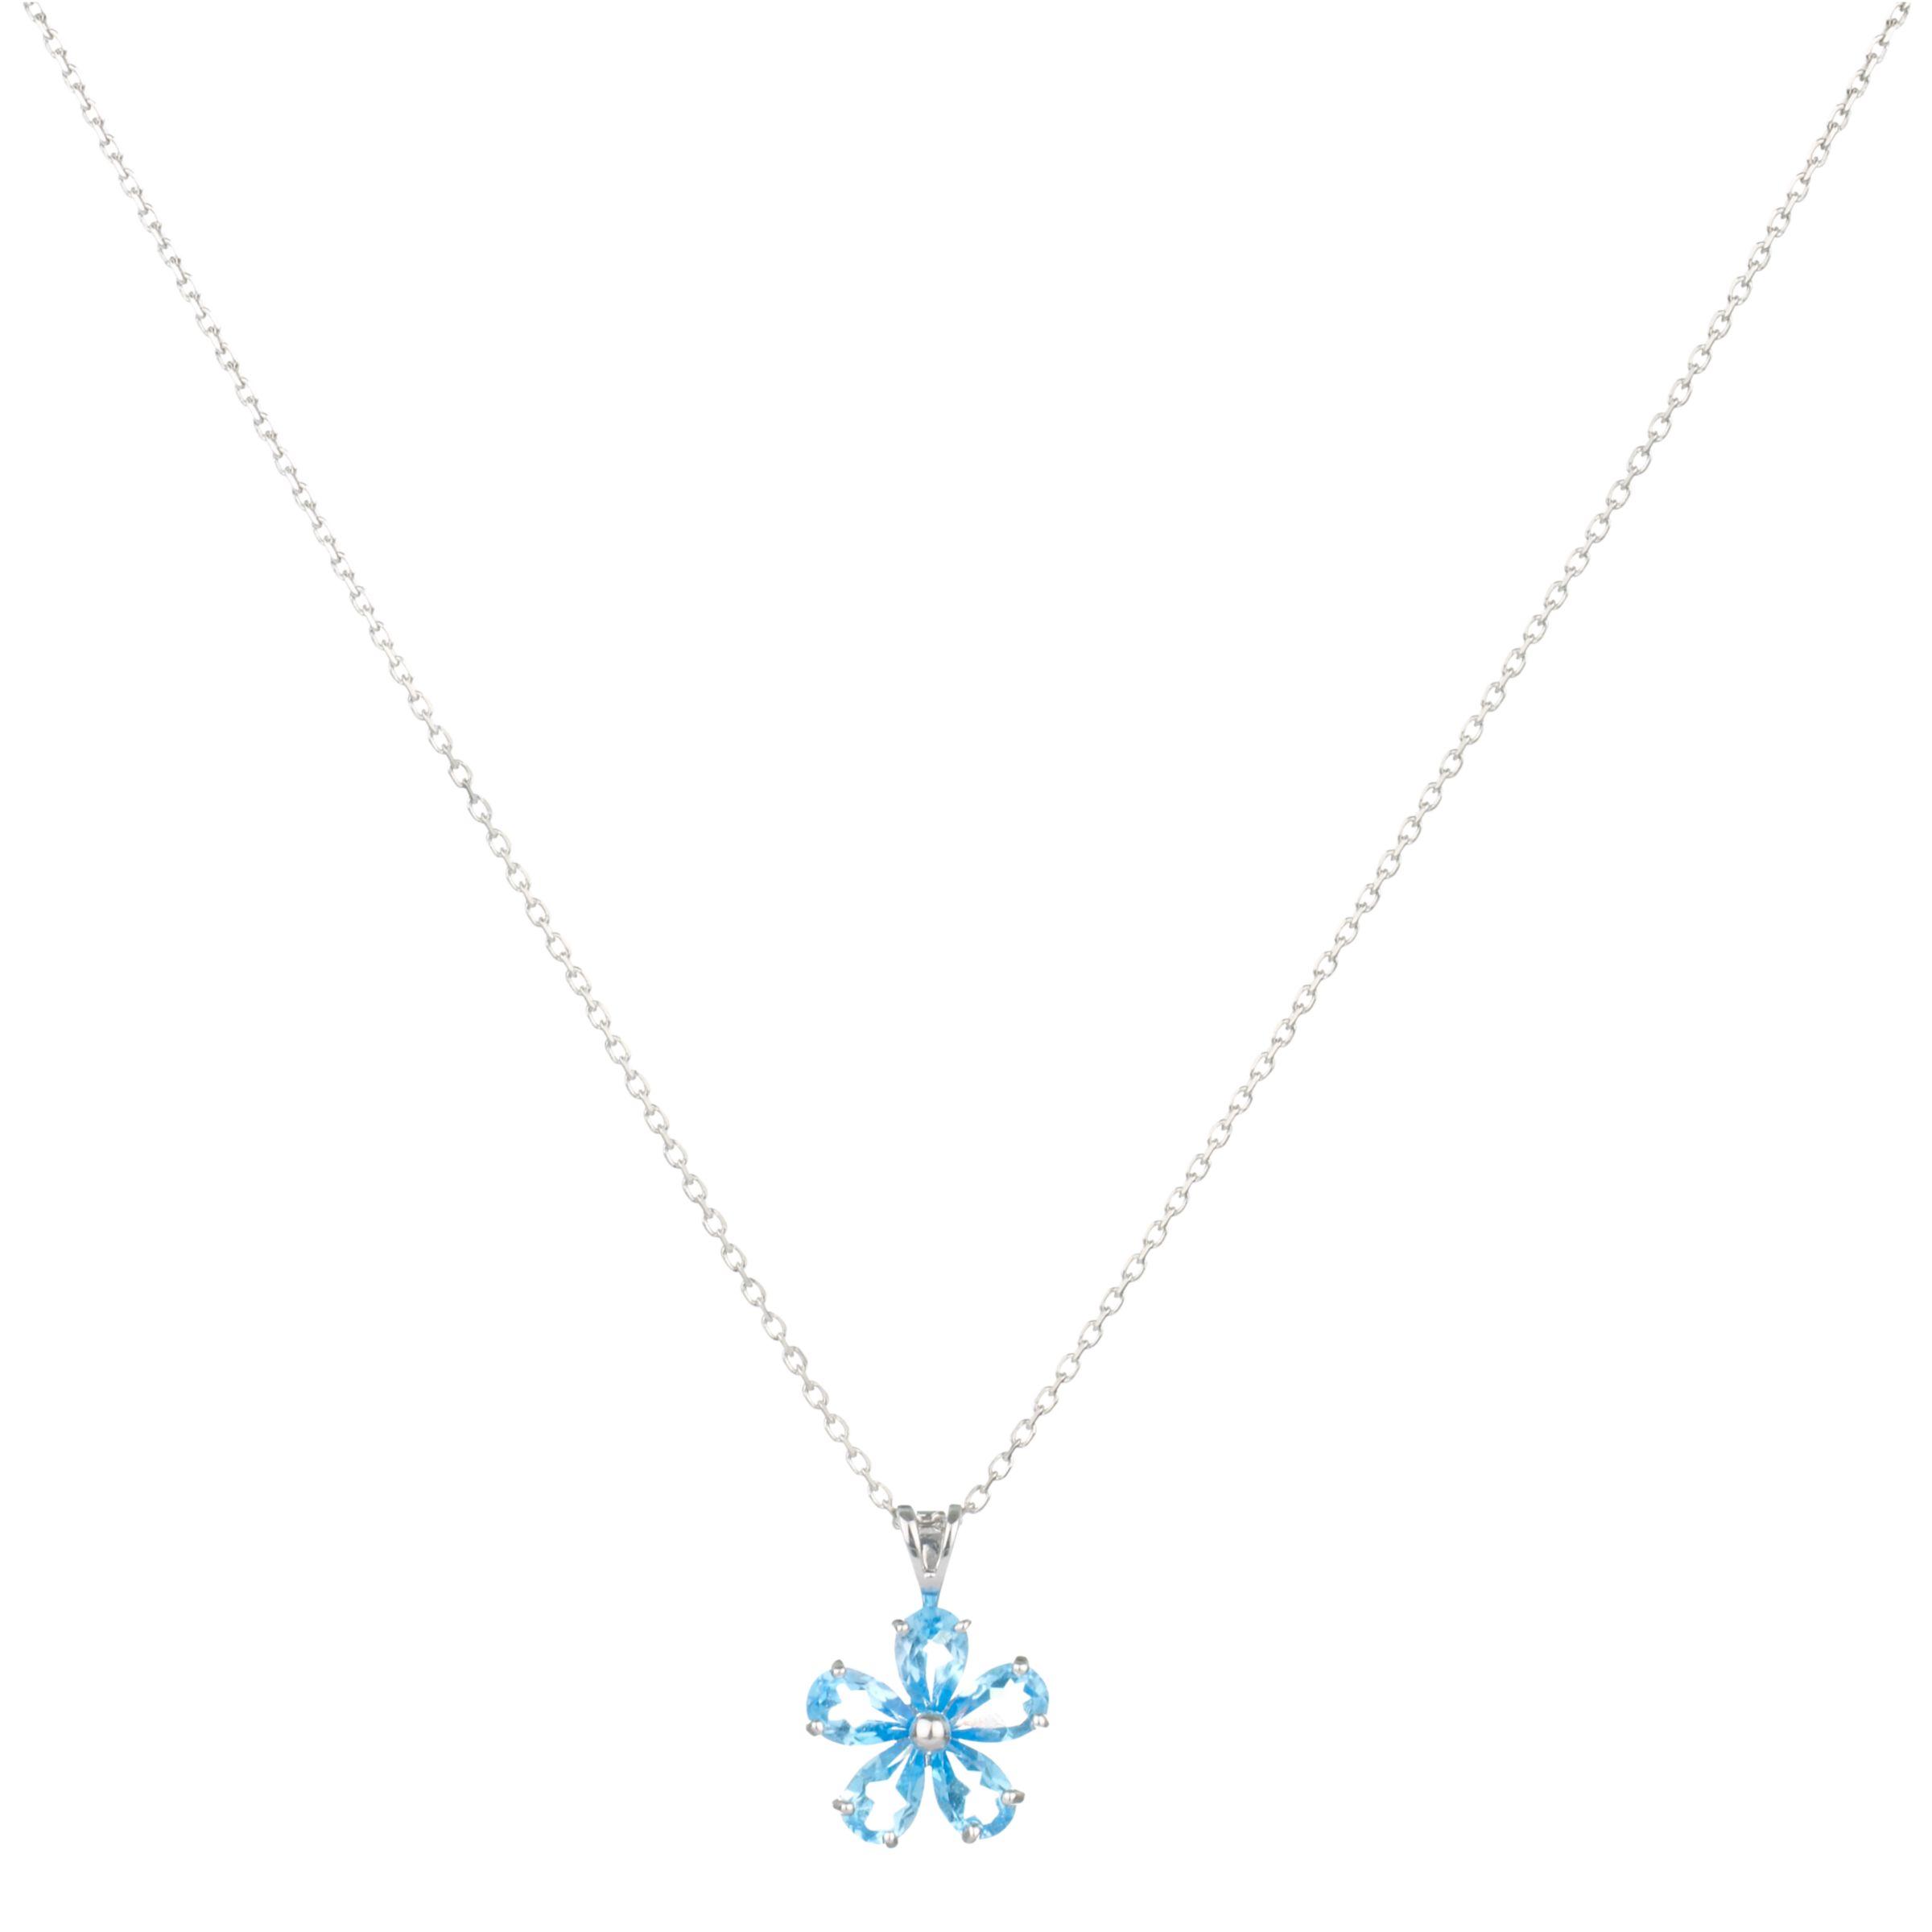 9ct White Gold Blue Topaz Daisy Flower Pendant Necklace